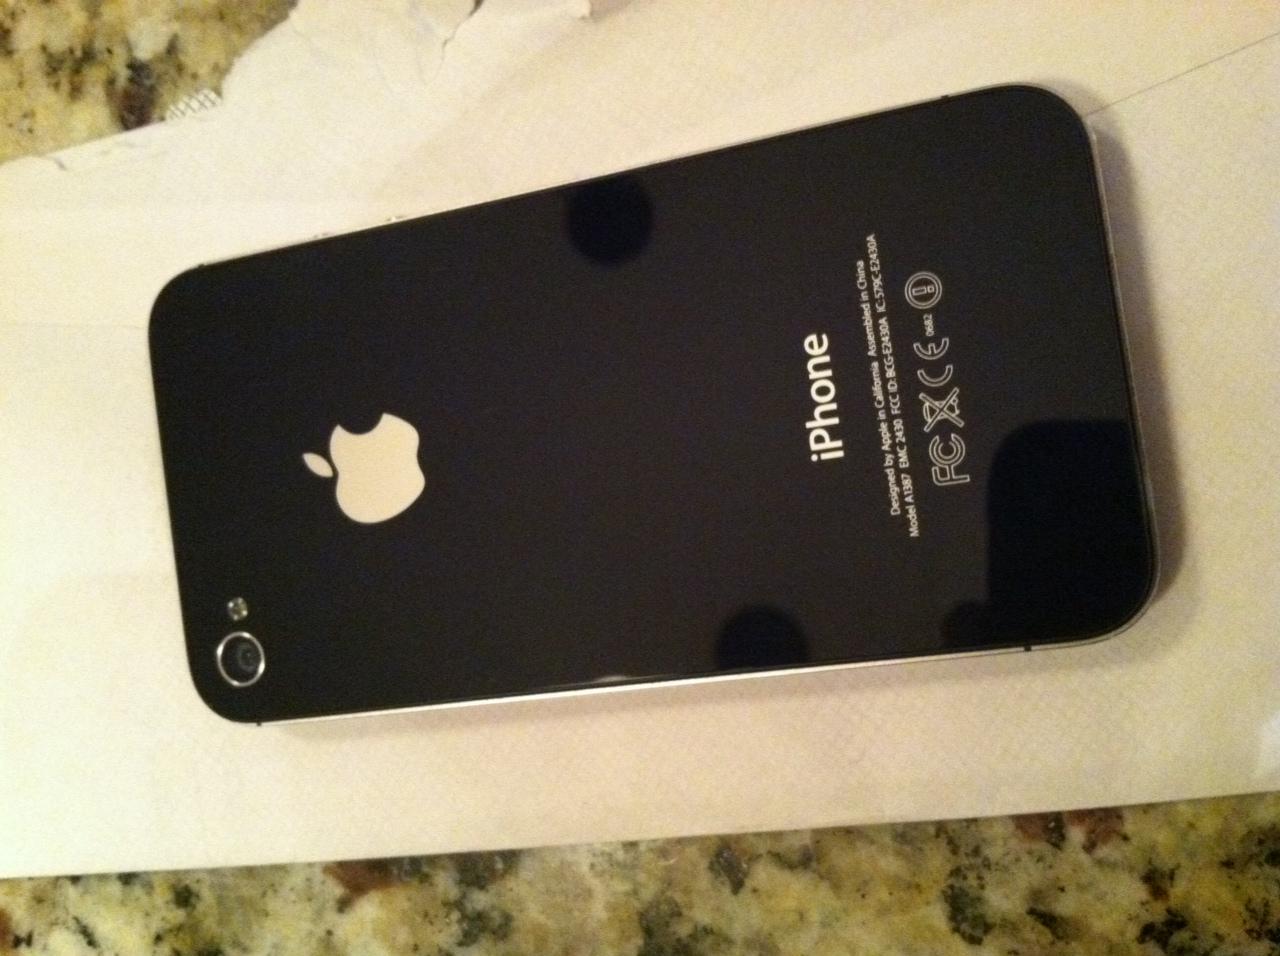 Iphone 4 Black Used iphone 4 black 32gb fa...